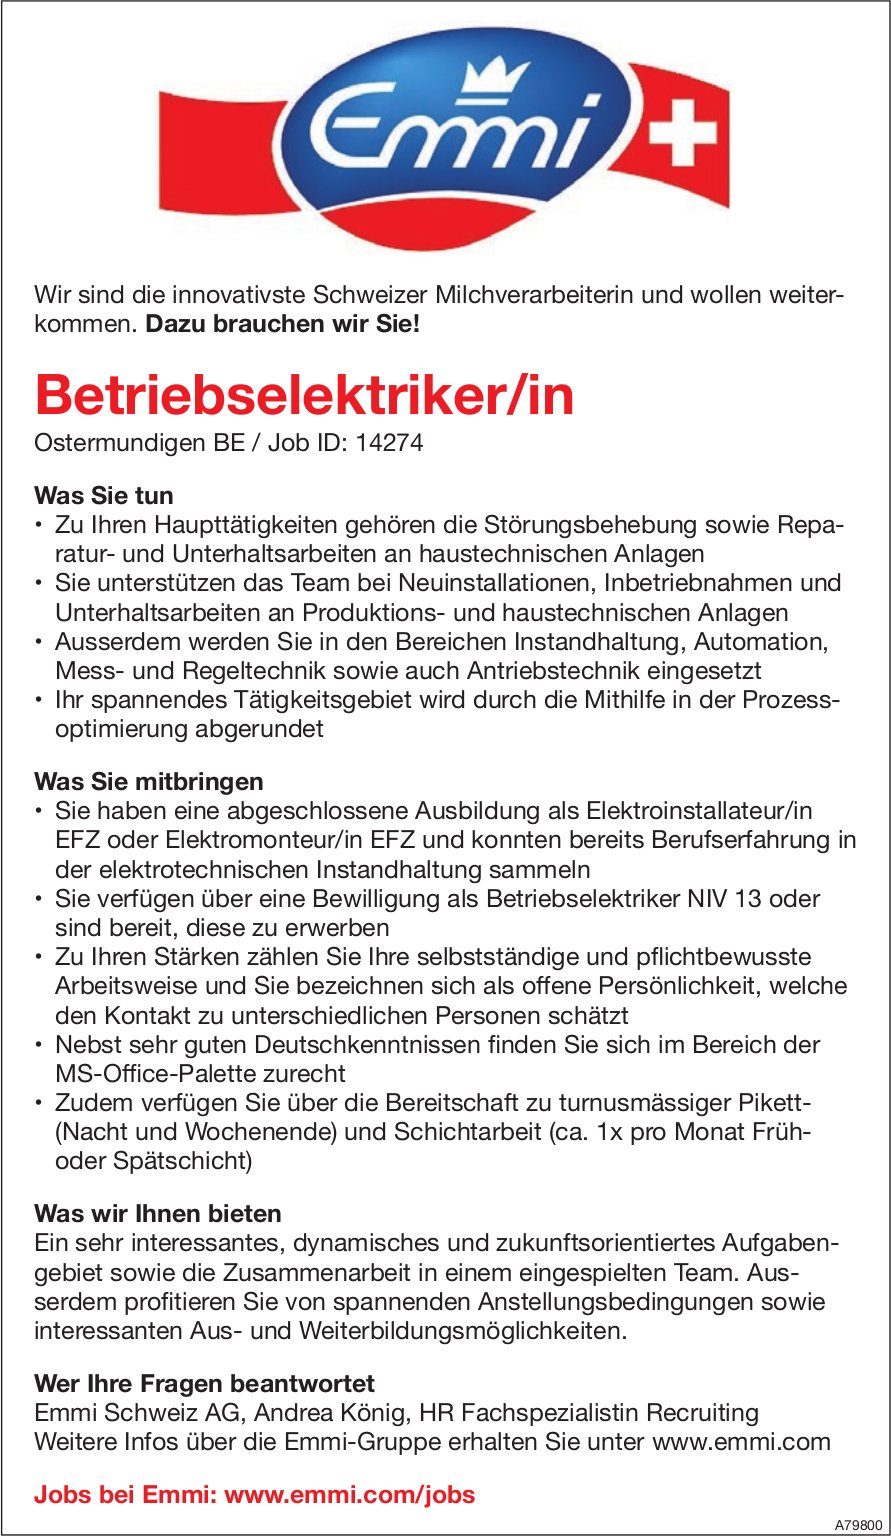 Betriebselektriker/in, Emmi Schweiz AG, Ostermundigen BE, gesucht